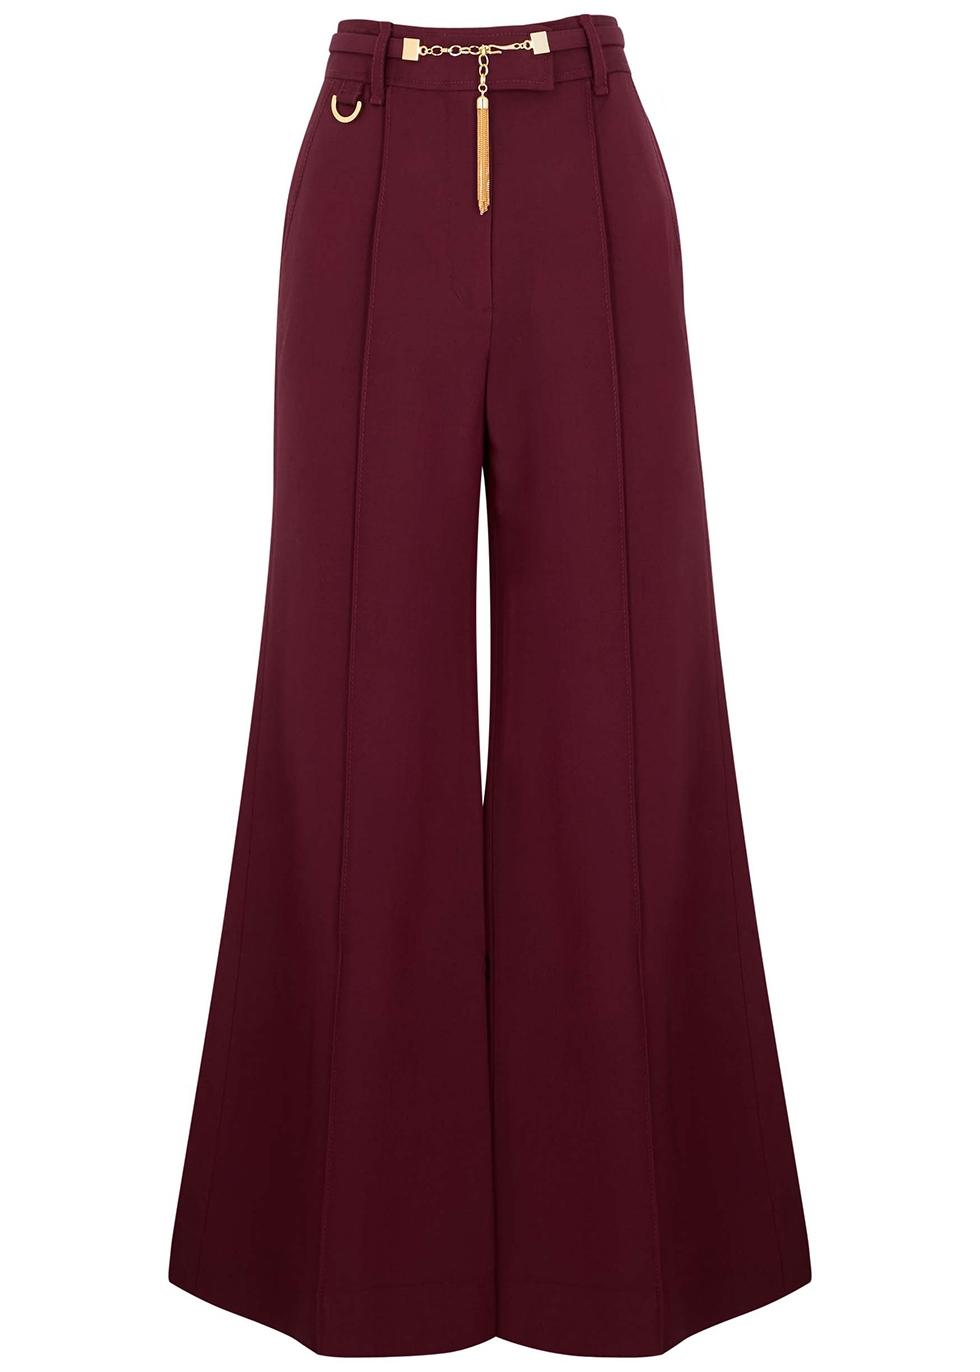 Concert burgundy wool-blend trousers